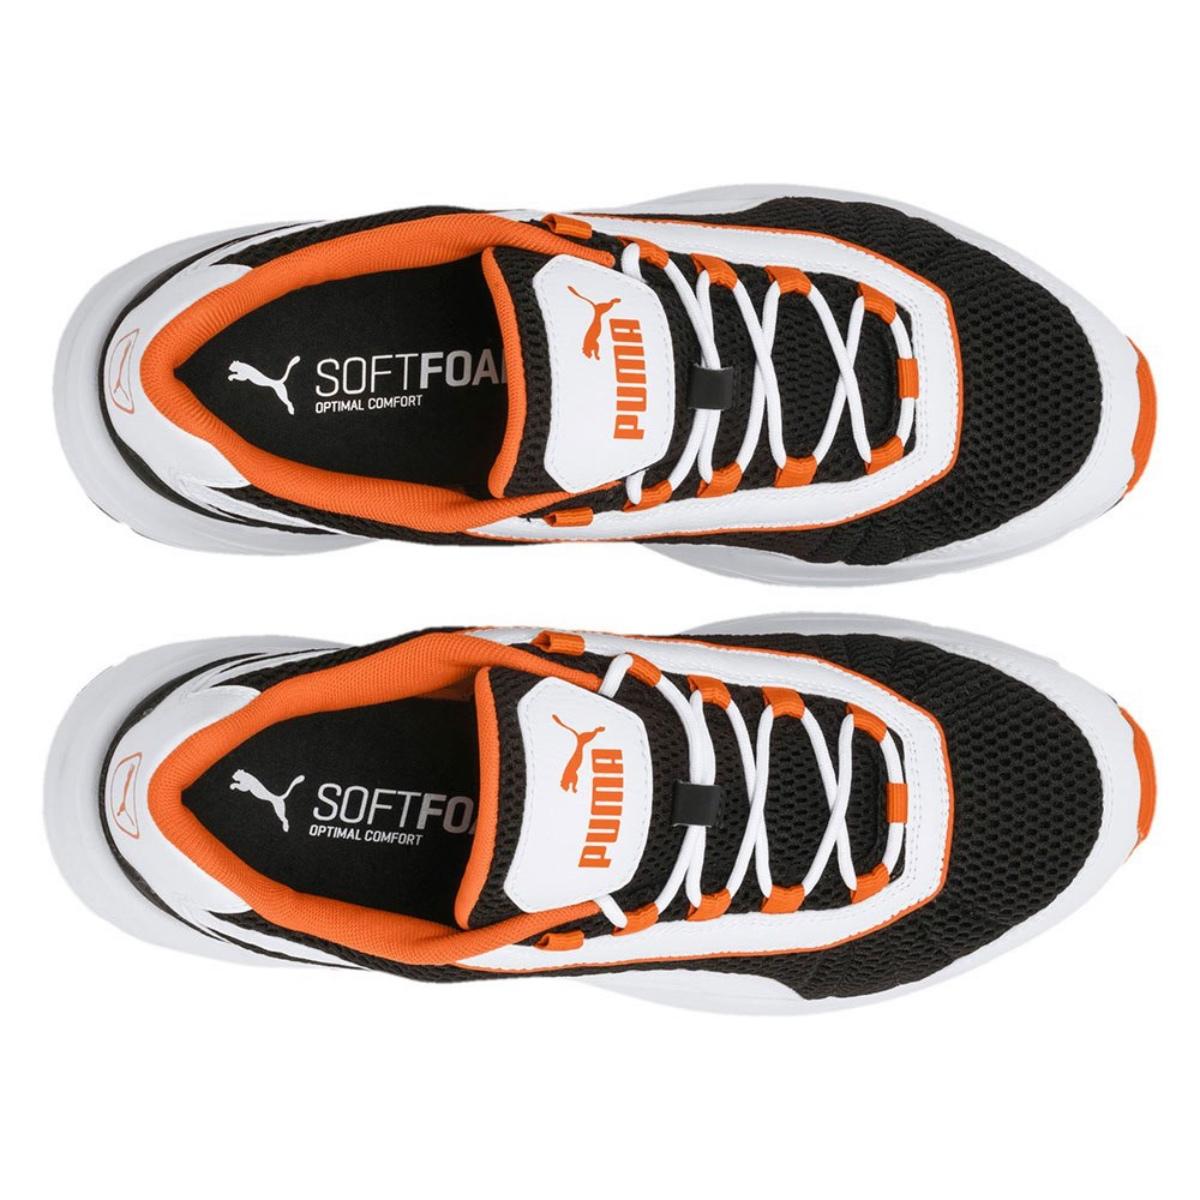 Puma NUCLEUS Unisex Fitnessschuhe Sneaker Turnschuhe 369777